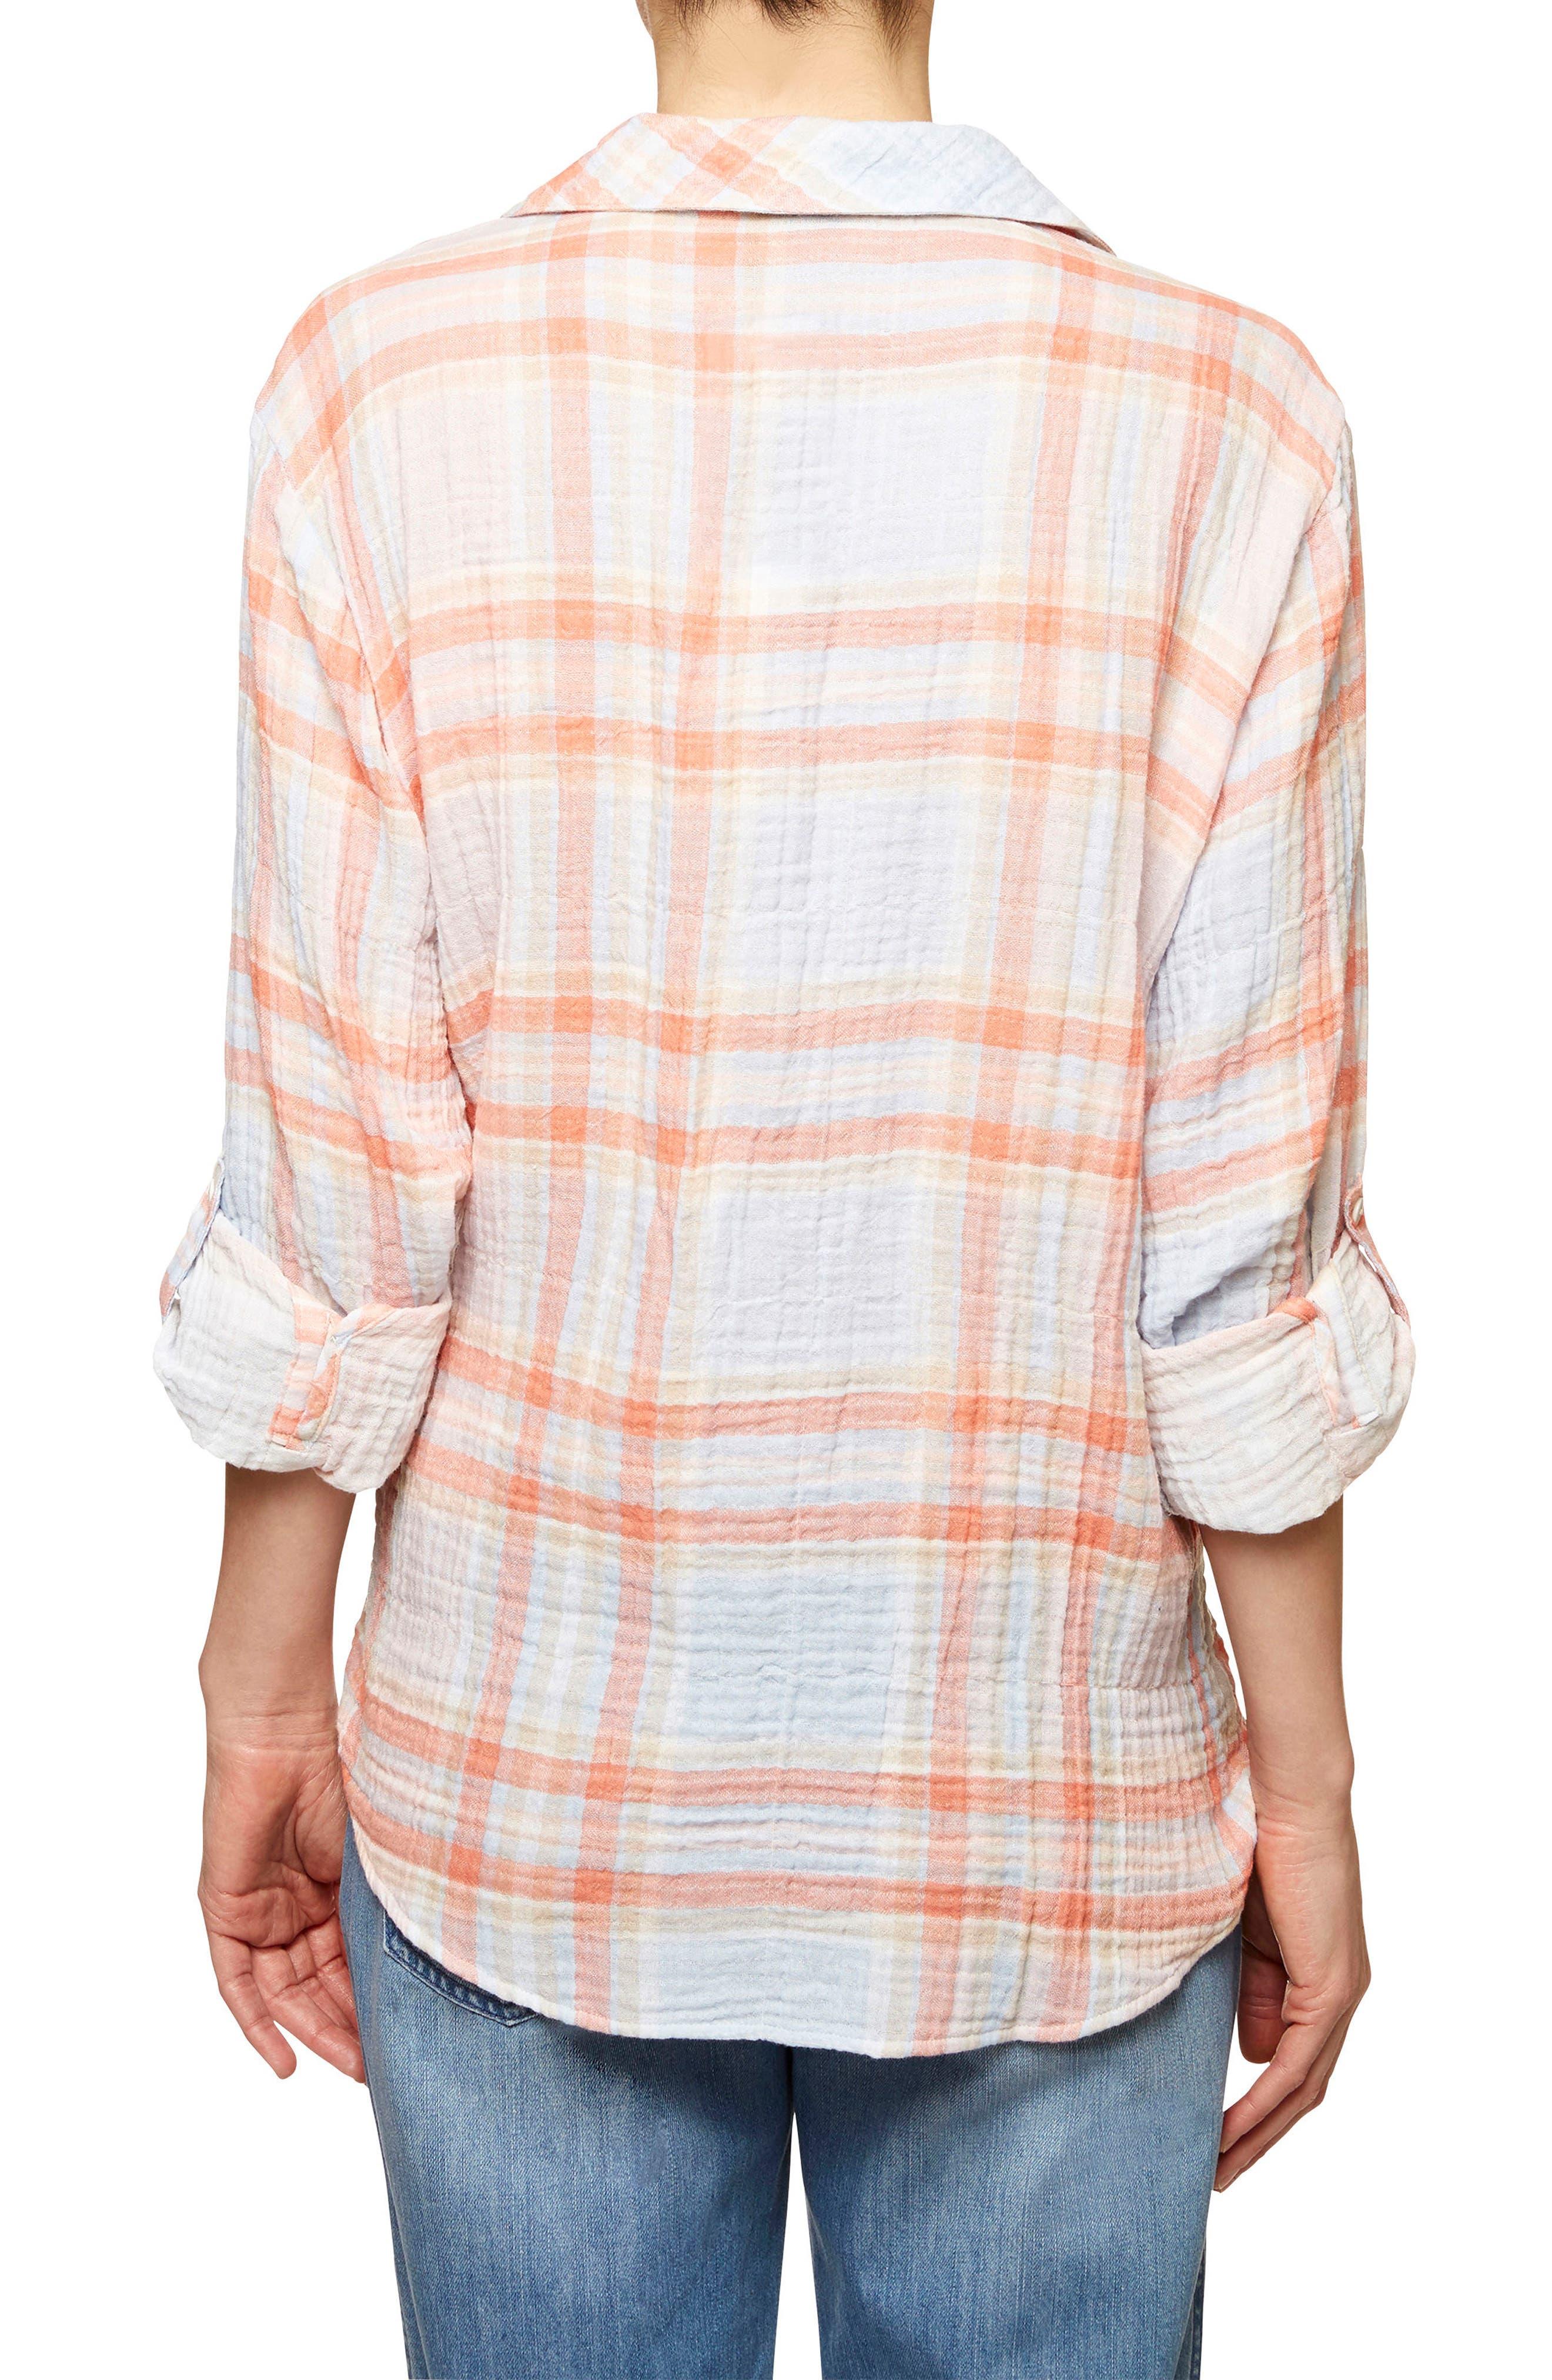 Steady Boyfriend Plaid Shirt,                             Alternate thumbnail 2, color,                             493